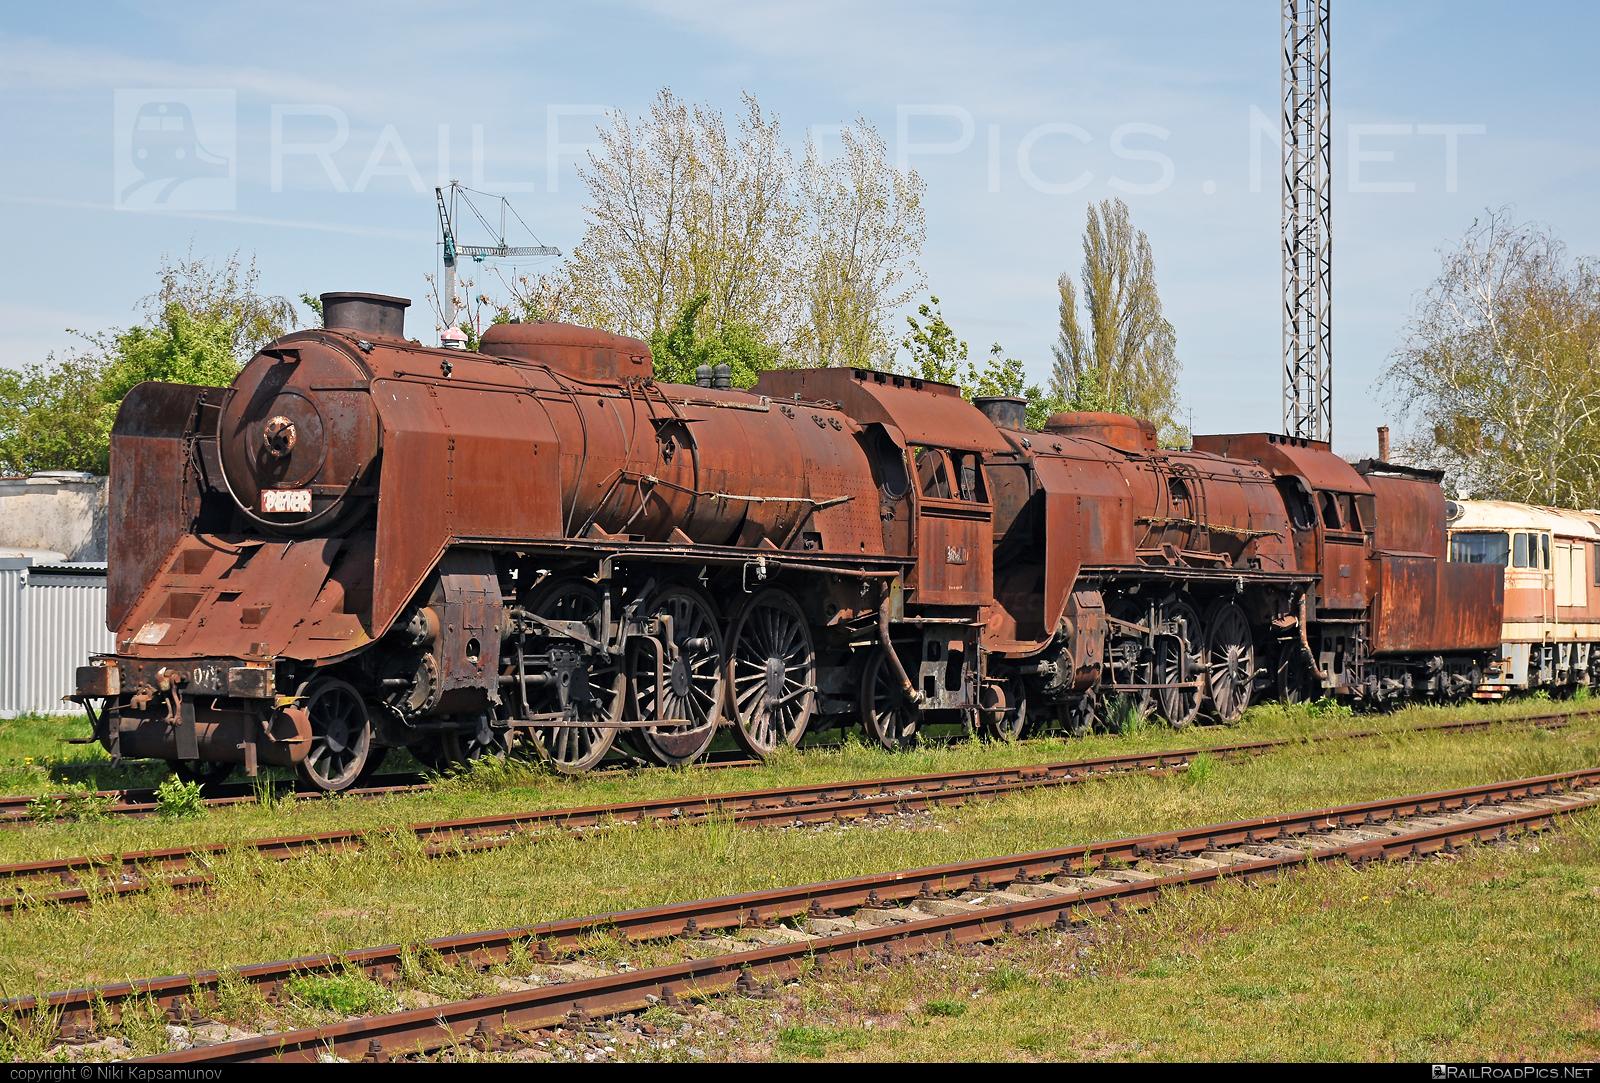 Škoda 10Lo3 - 387.017 operated by Železnice Slovenskej Republiky #csdclass387 #mikado #skoda #skoda10lo #skoda10lo3 #zelezniceslovenskejrepubliky #zsr